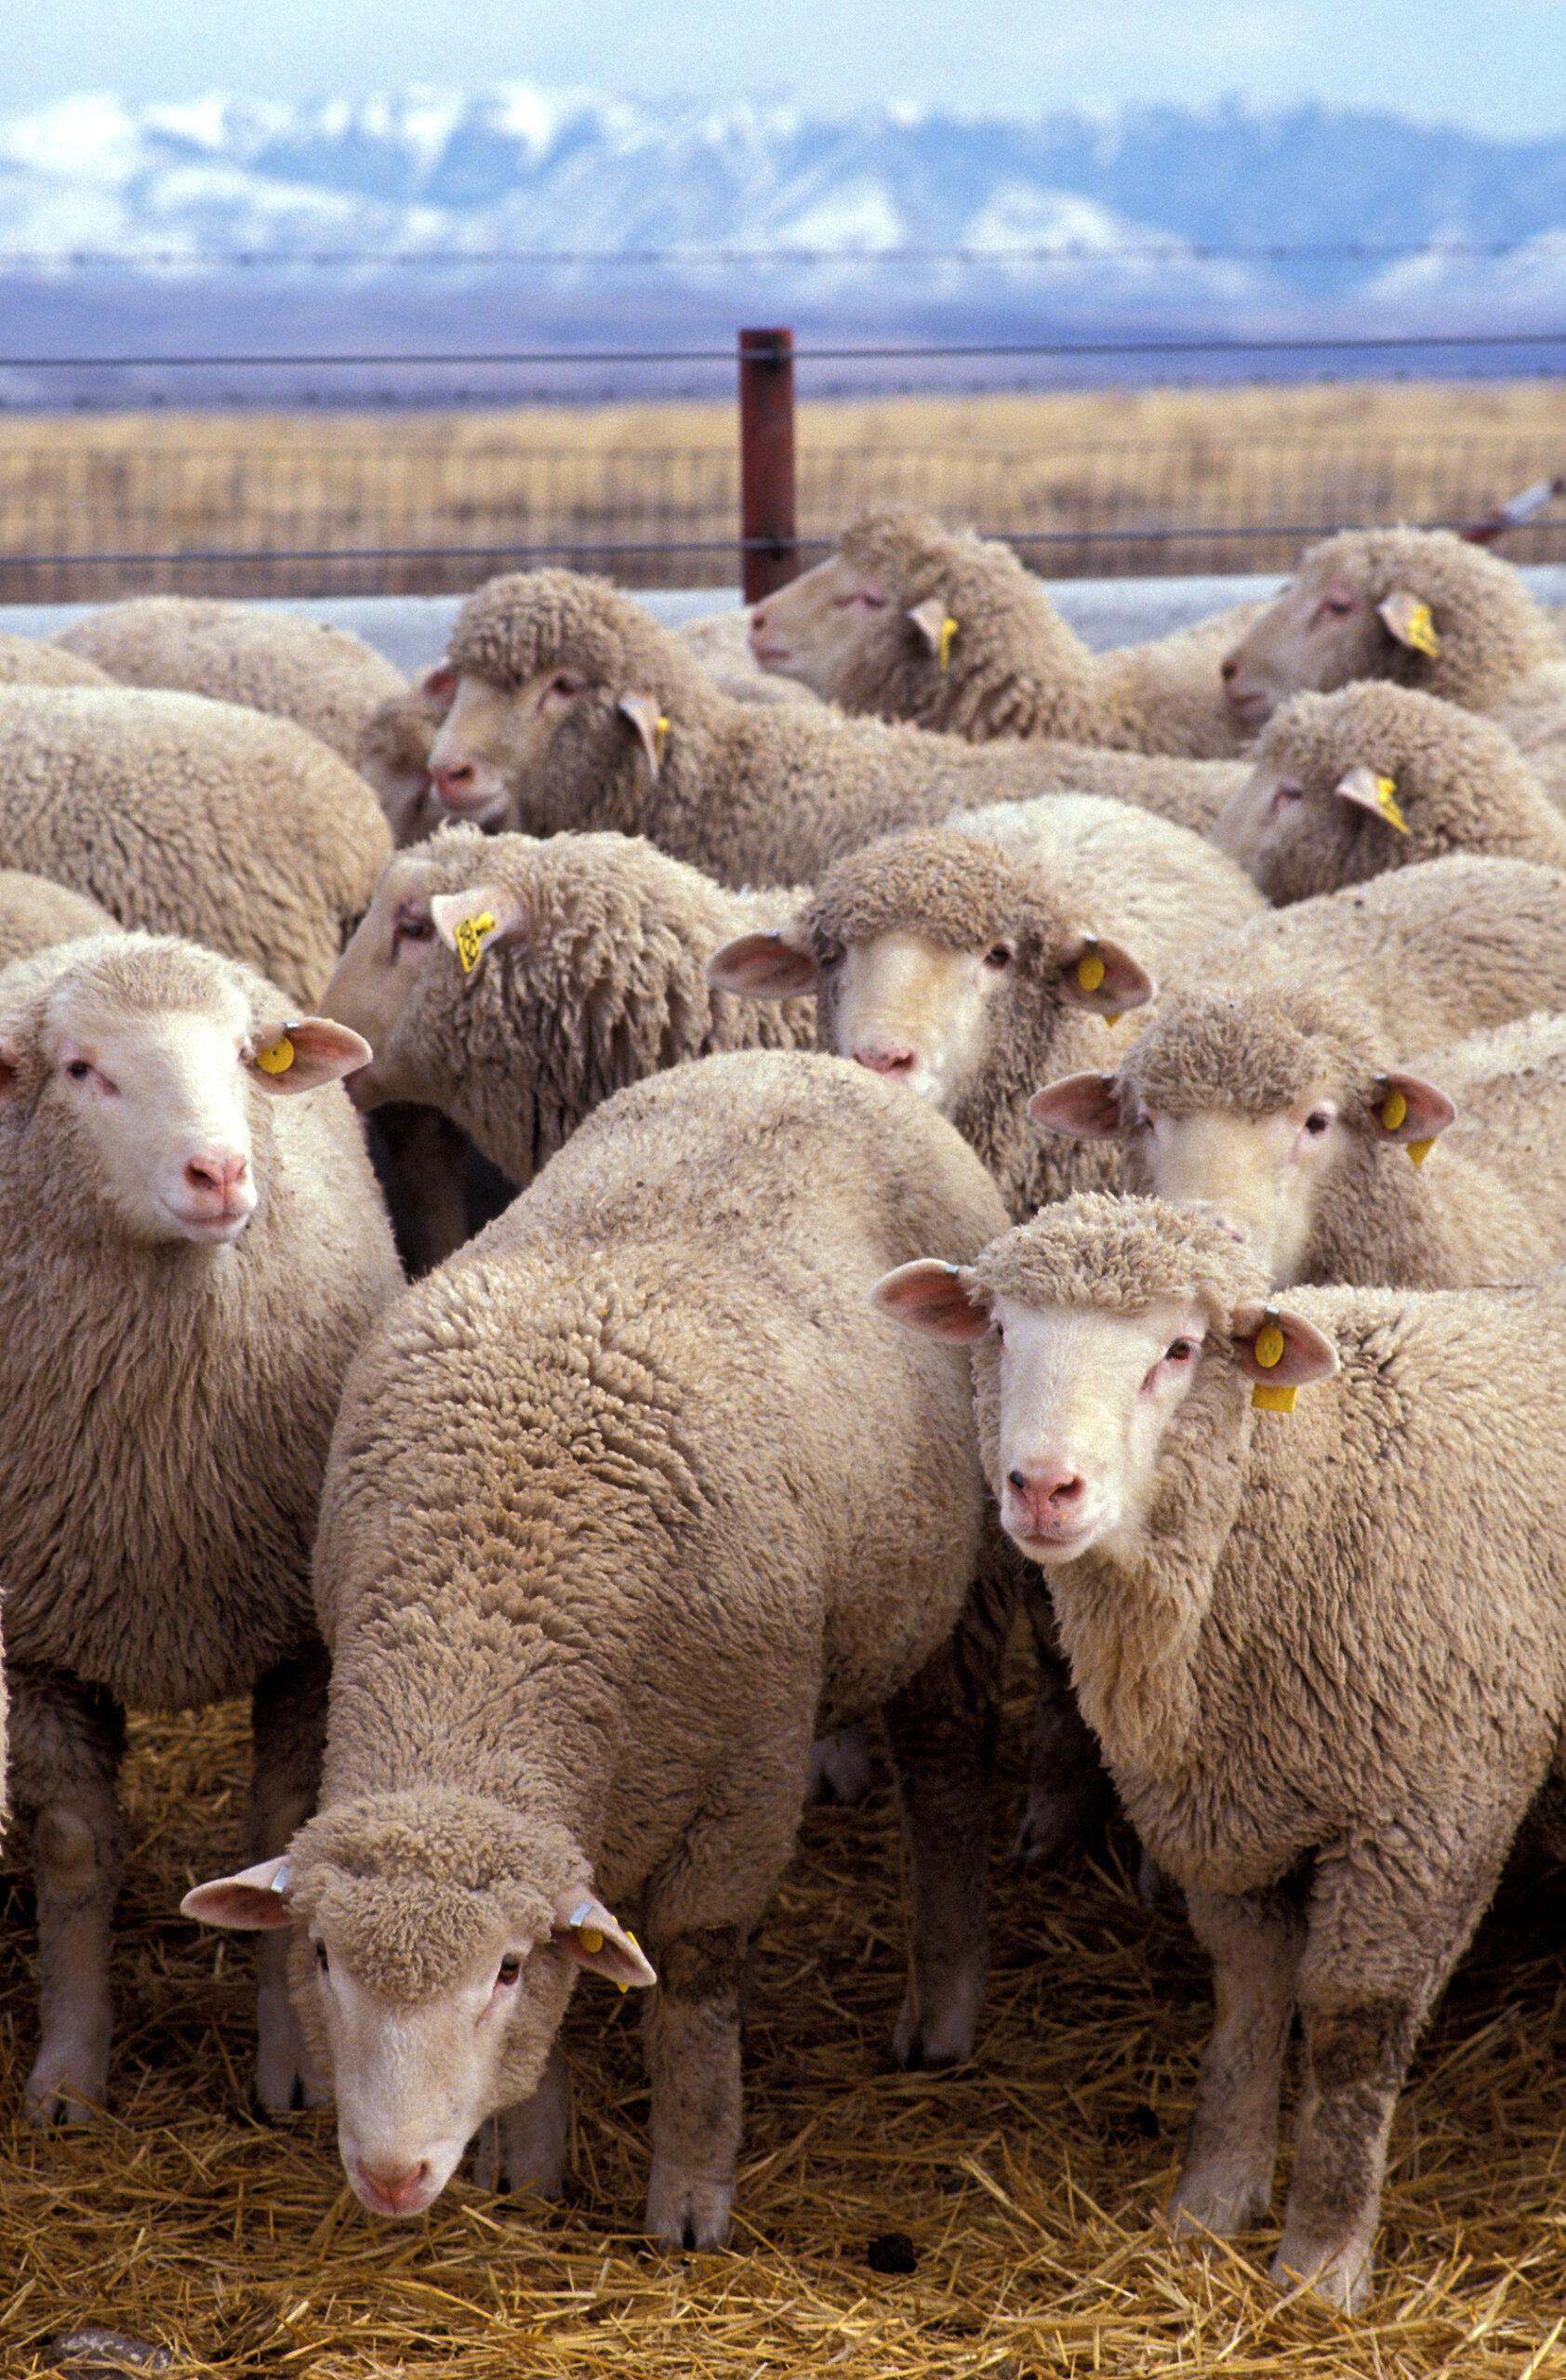 Domba   Wikipedia Bahasa Indonesia, Ensiklopedia Bebas in Gambar Domba Banyak